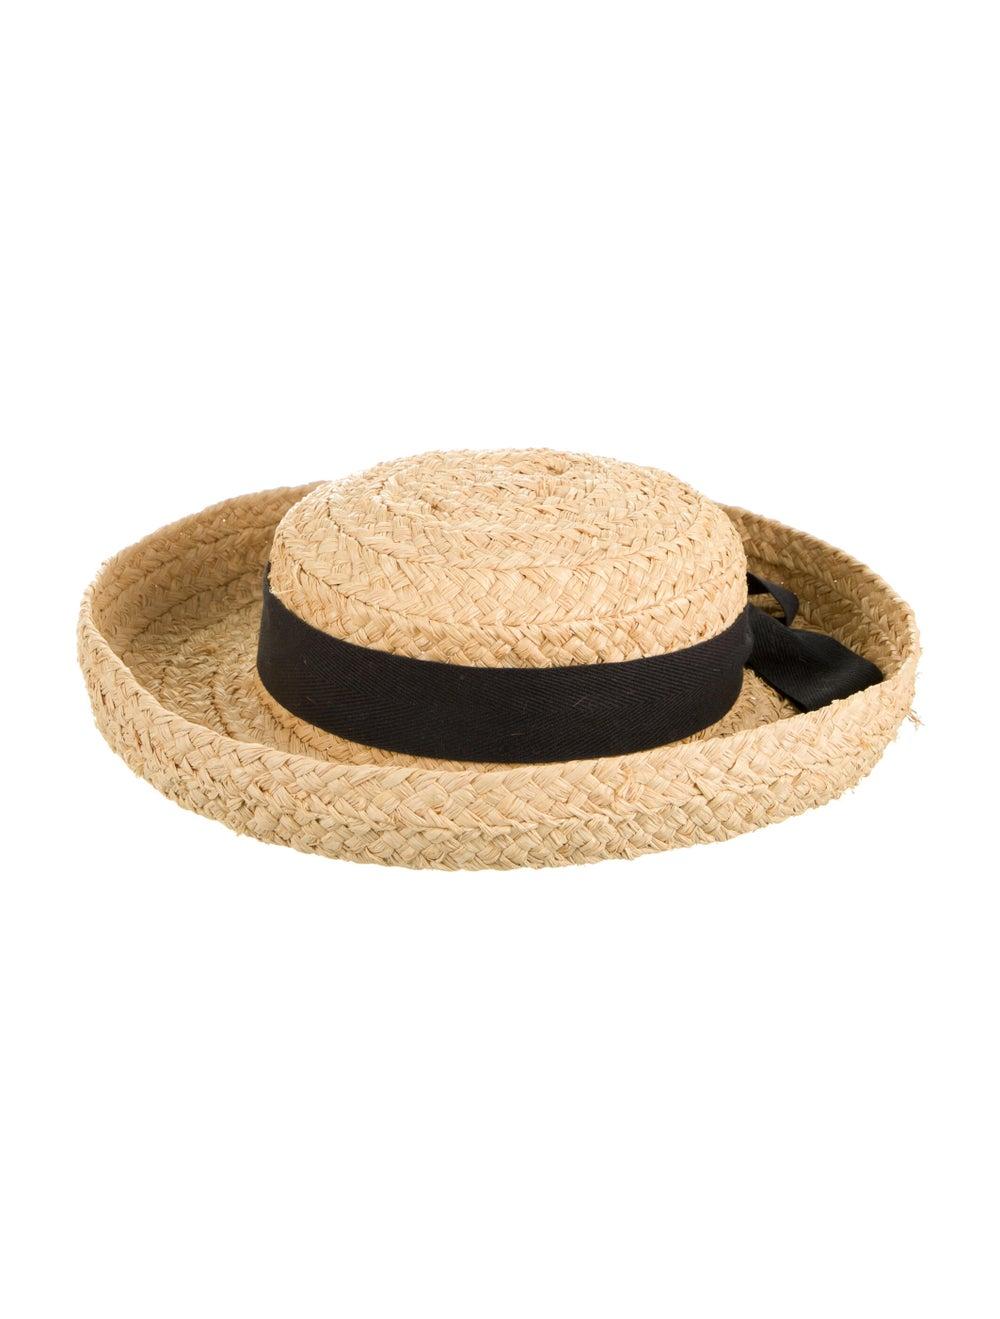 Helen Kaminski Straw Wide Brimmed Hat Tan - image 2